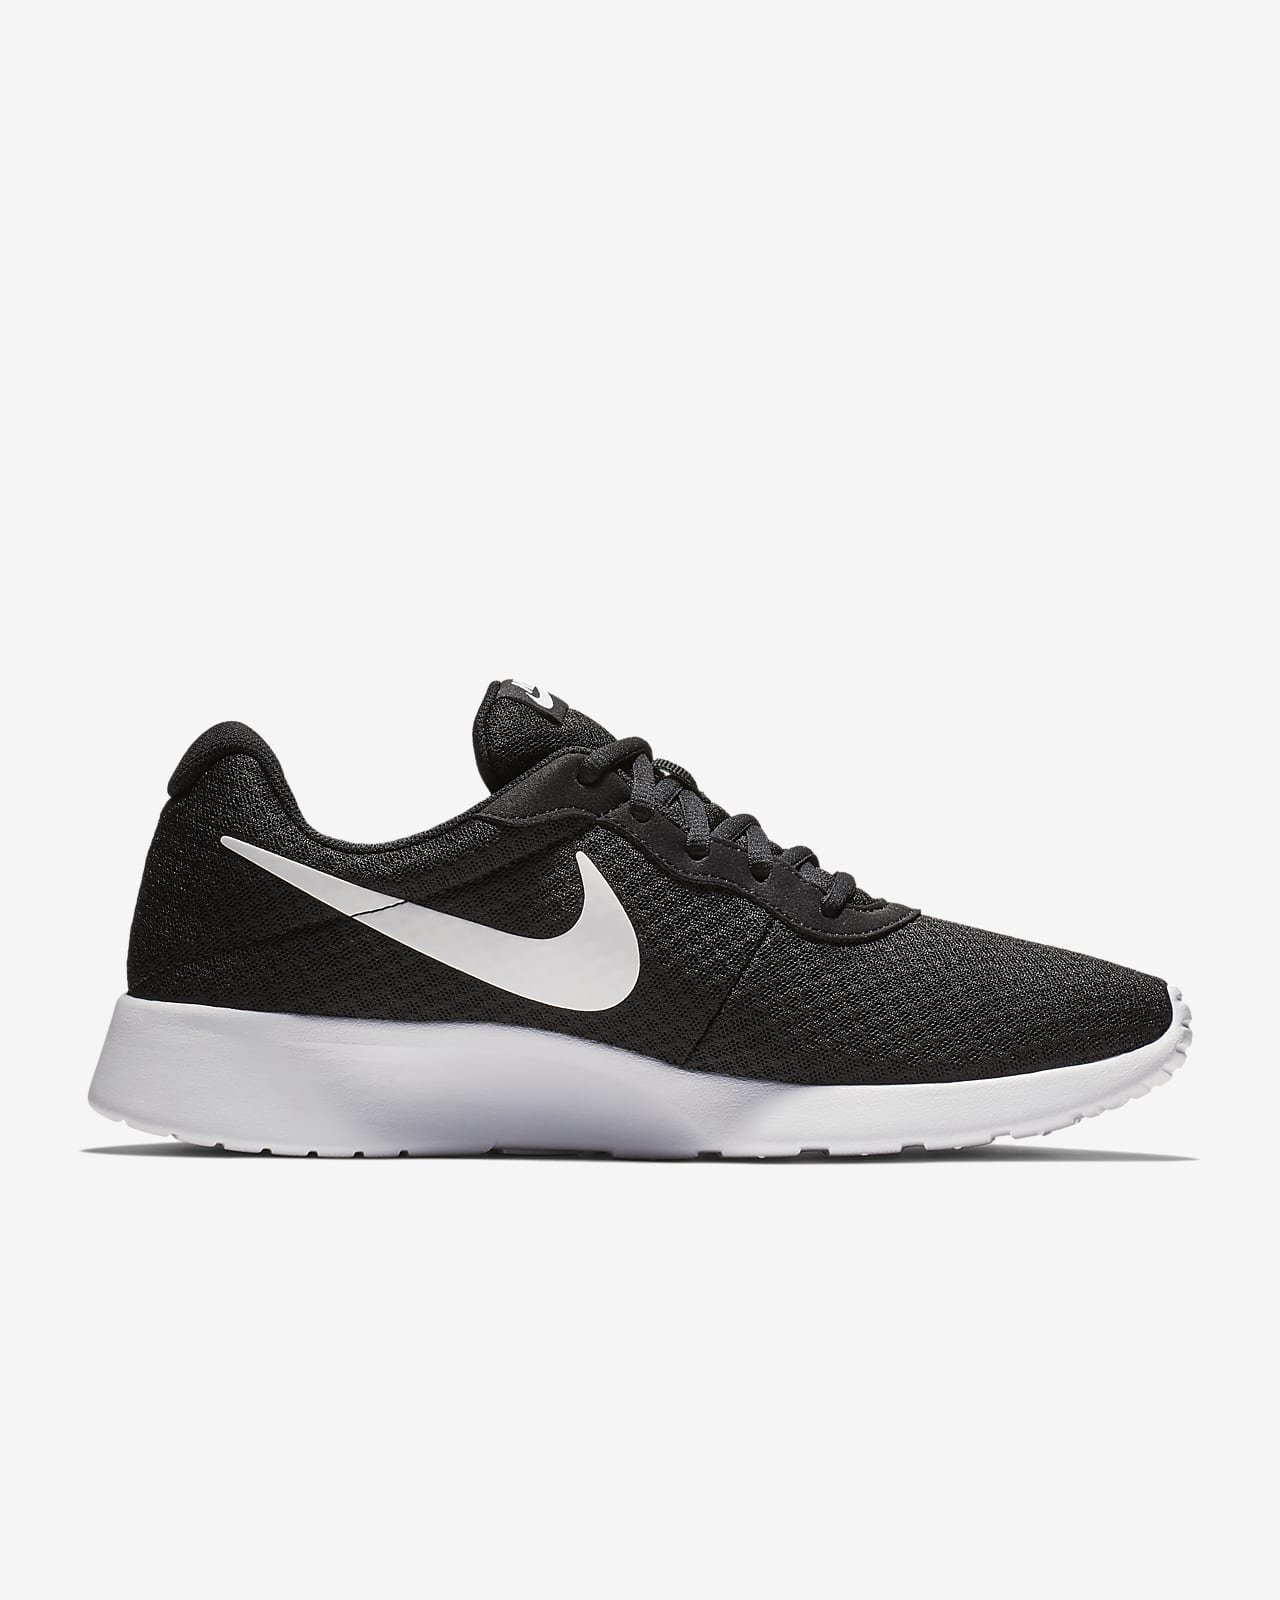 ligado Palabra Fatídico  Nike Tanjun Women's Shoe. Nike GB